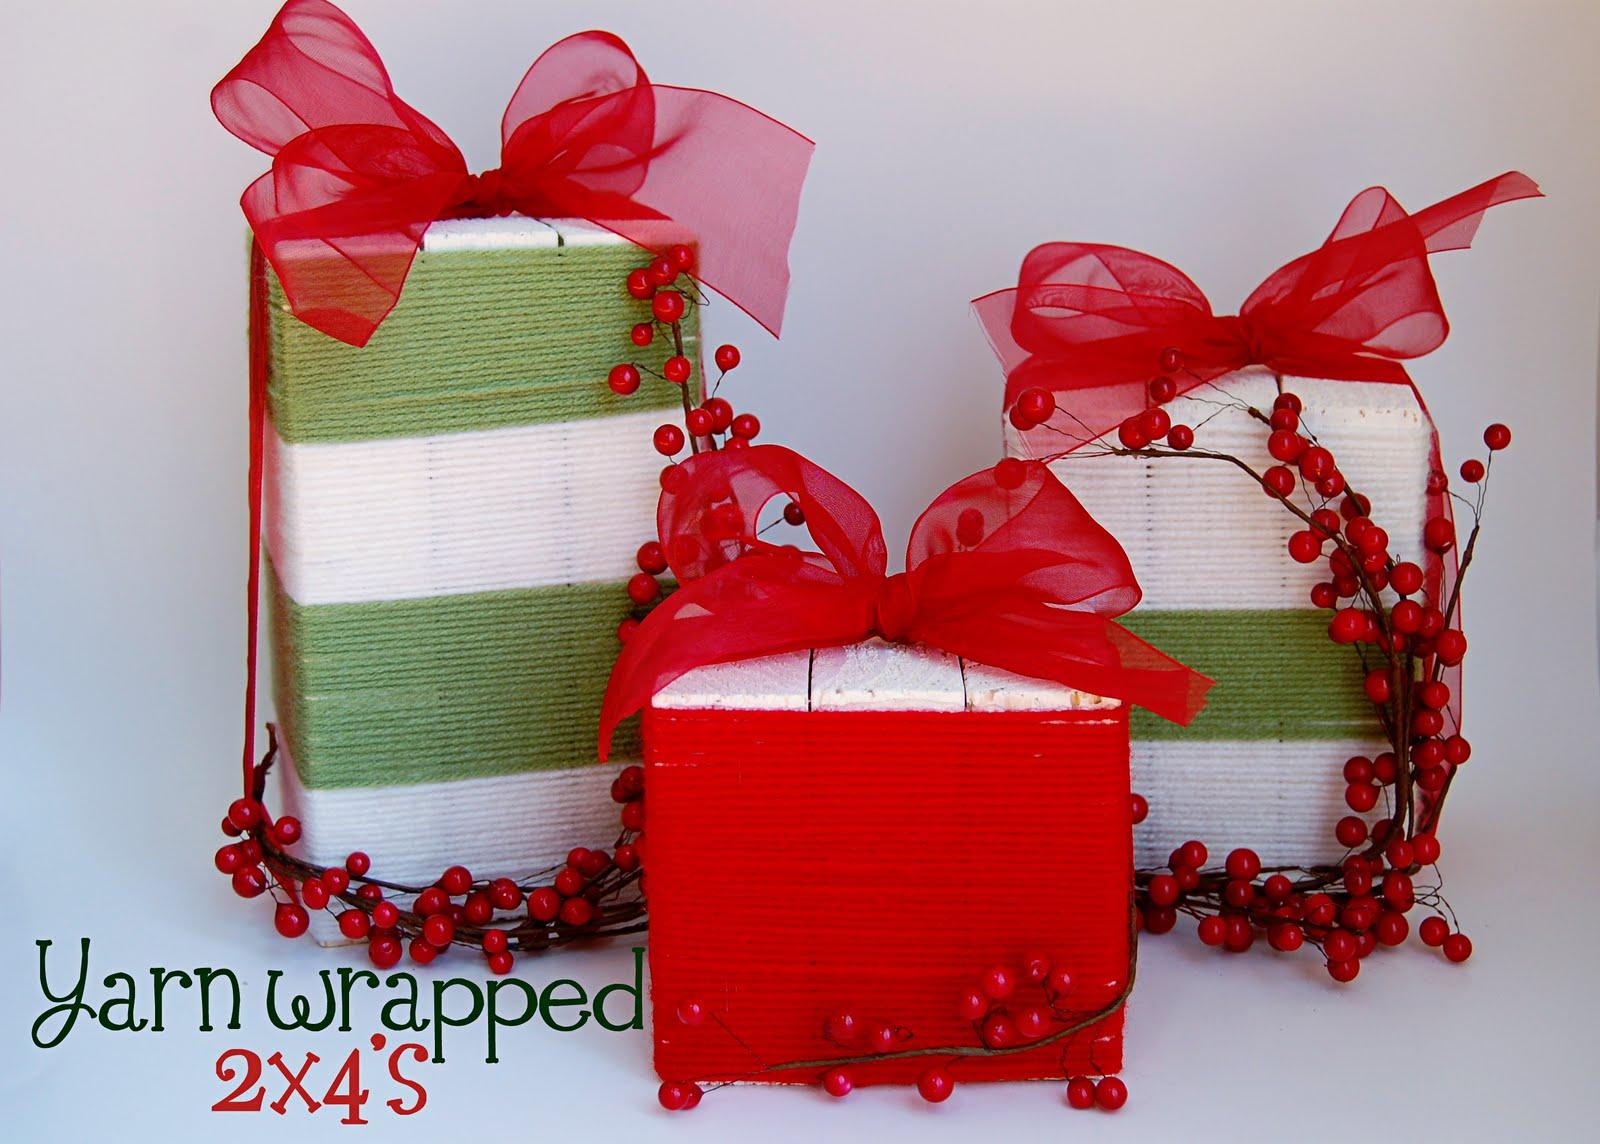 Wood Christmas Gifts So Adorable And Inexpensive To Make